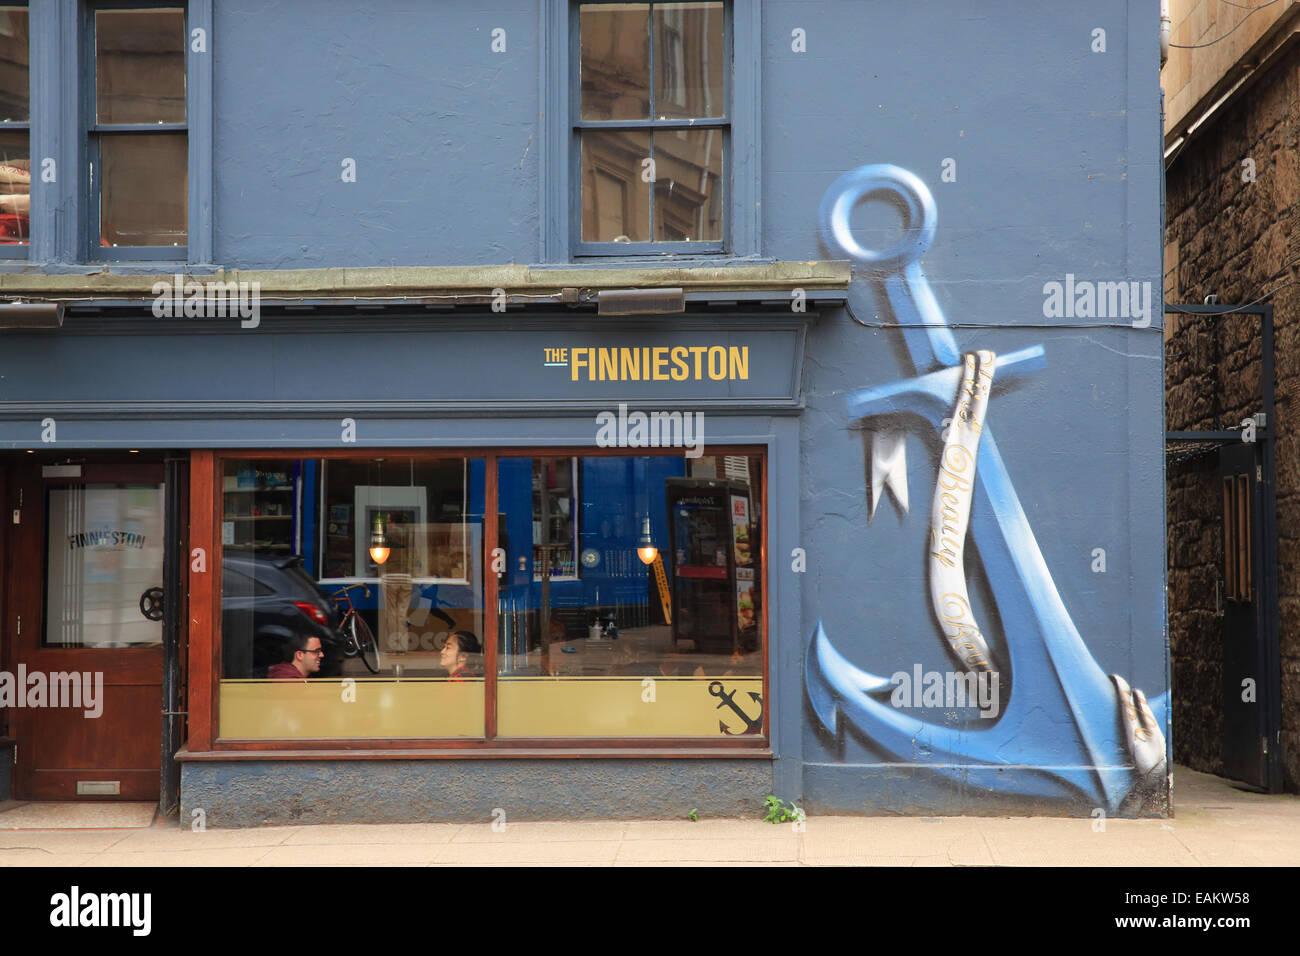 The Finnieston restaurant, on the trendy regenerated 'Finnieston Strip', on Argyle Street, in Glasgow, Scotland, - Stock Image